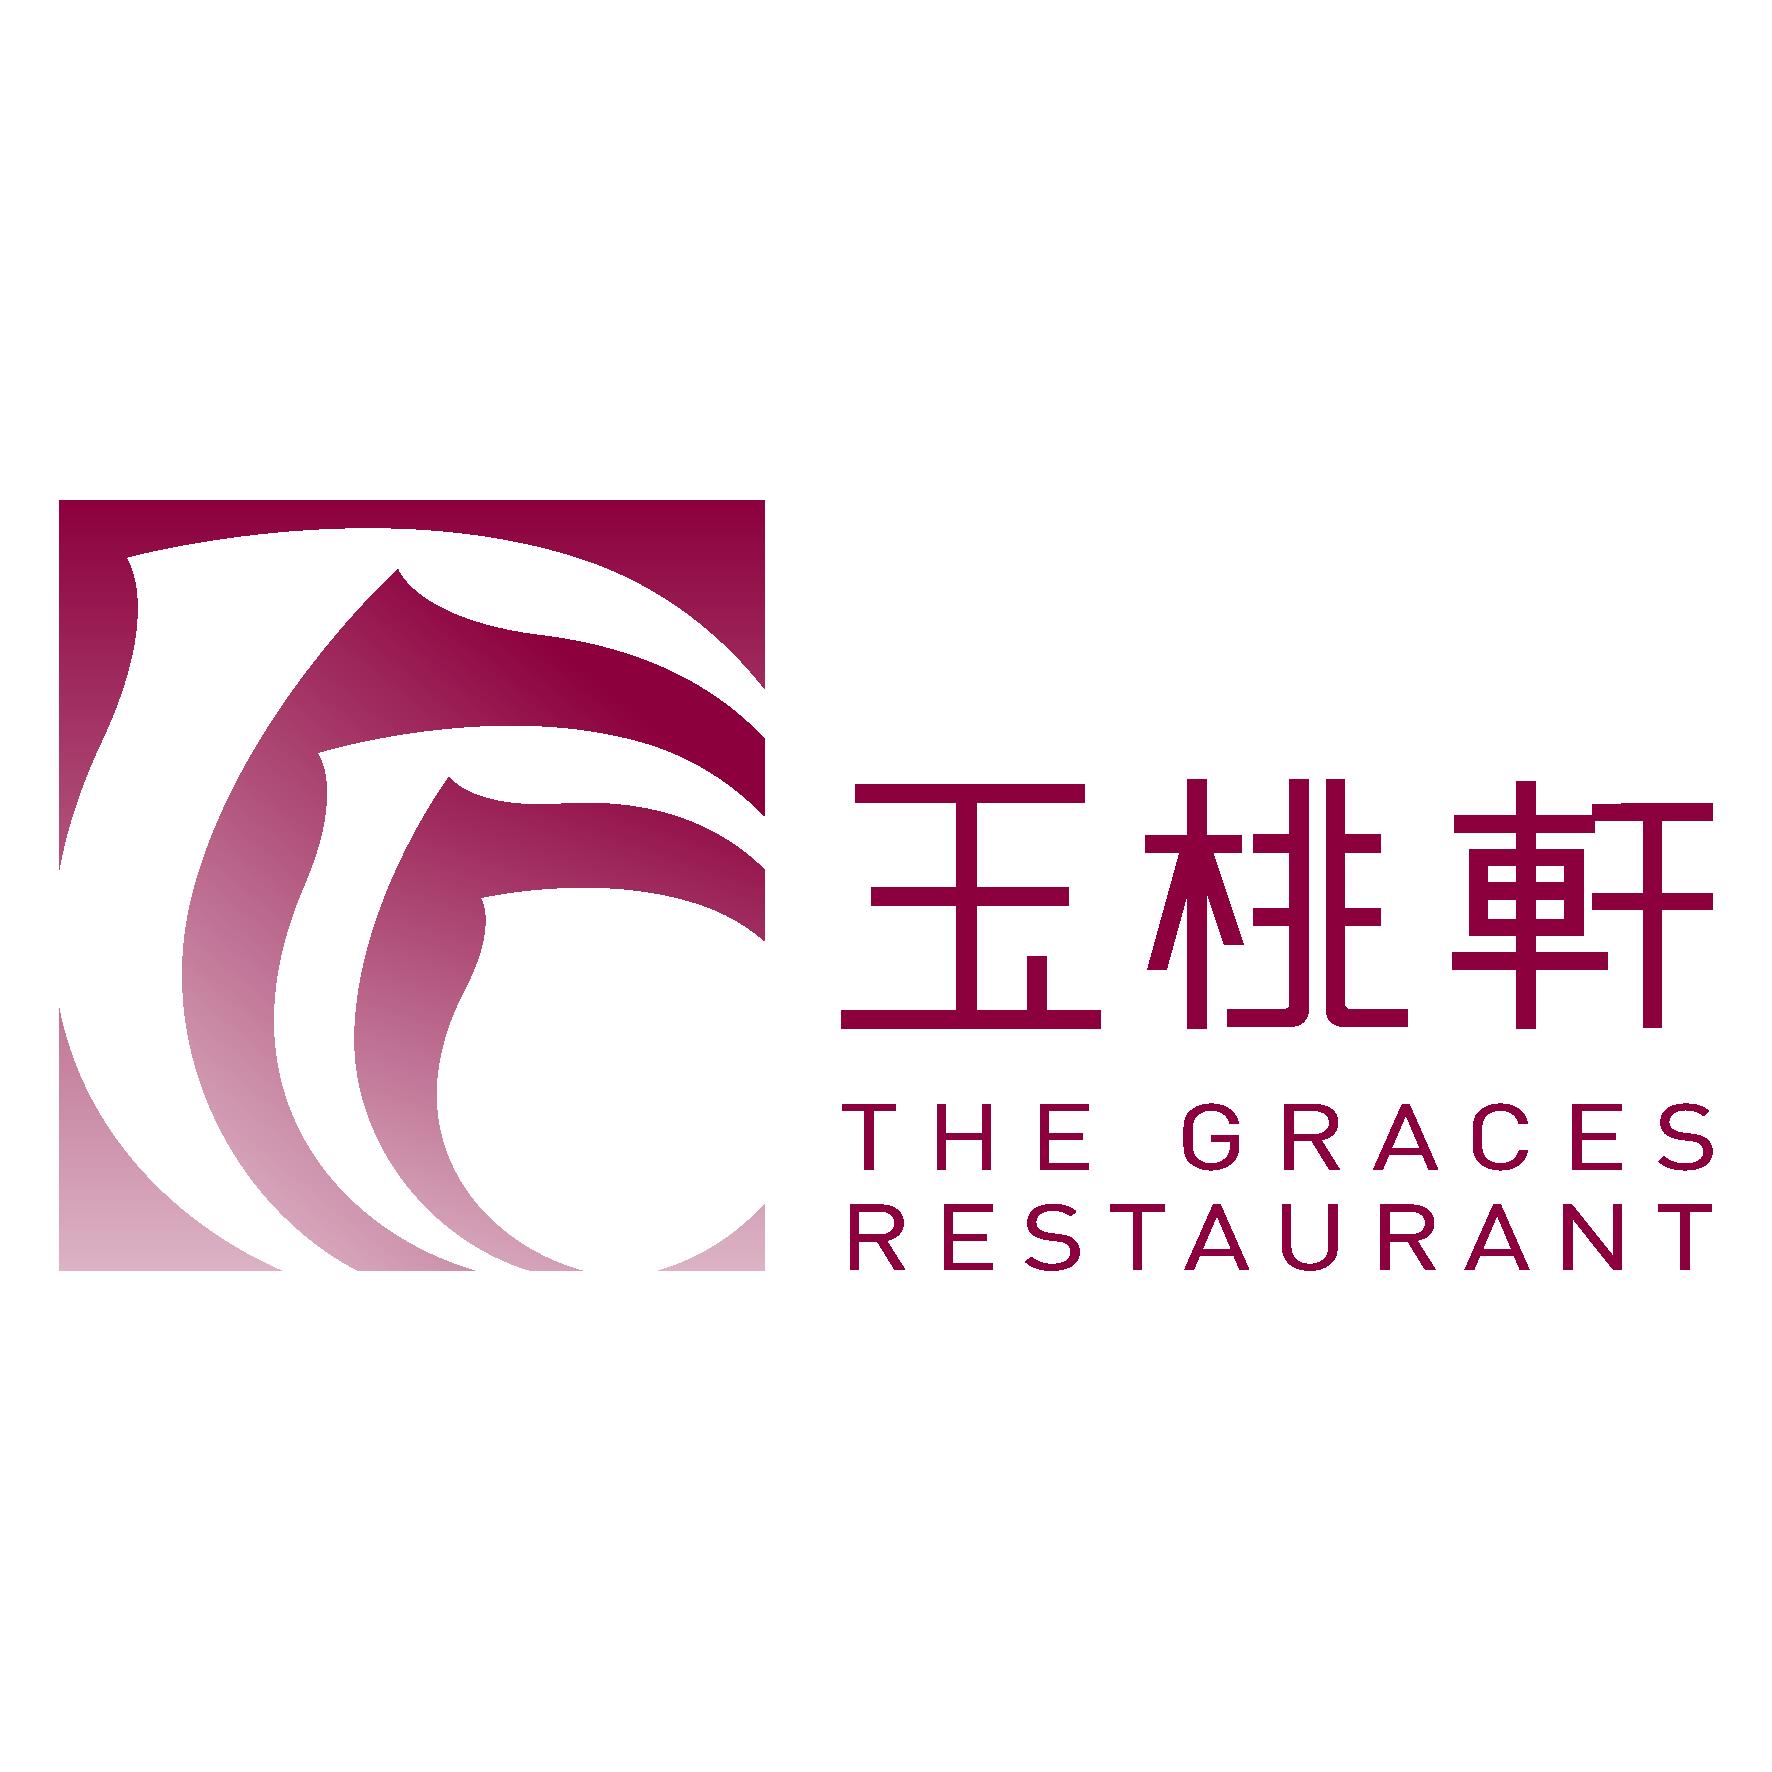 GracesRestaurant.png